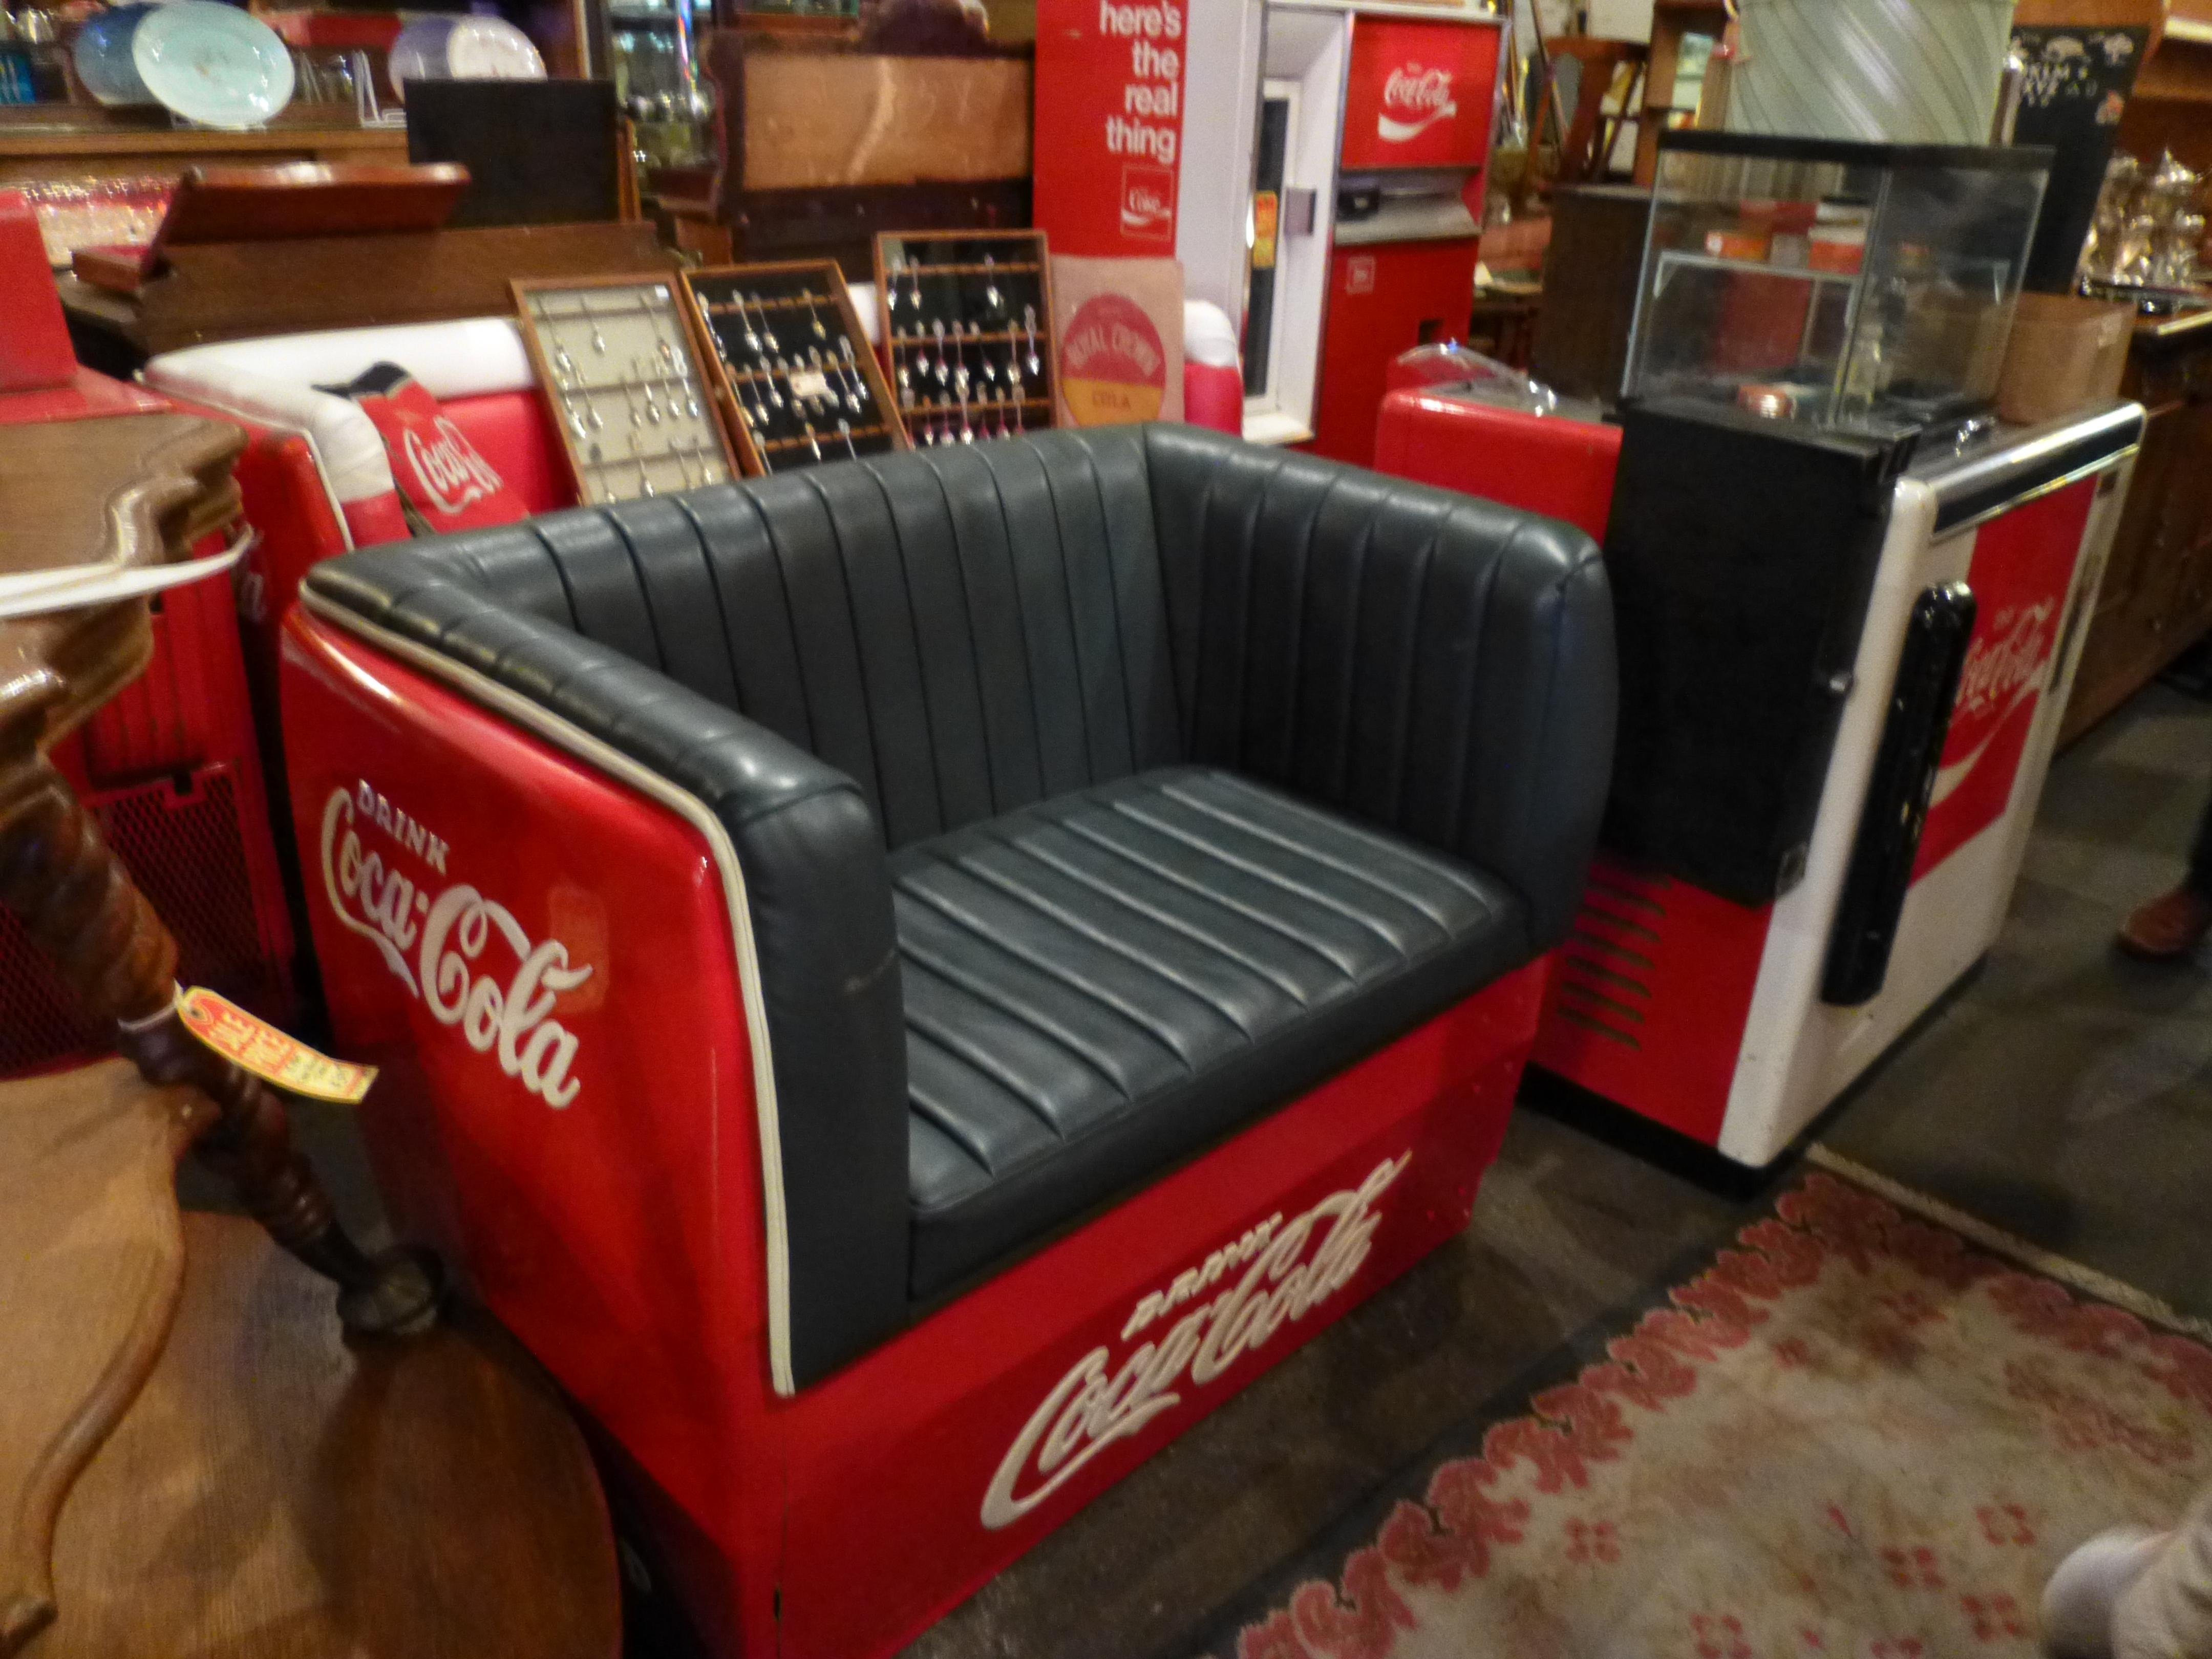 Vintage Coca Cola Cooler Furniture The Worleygig